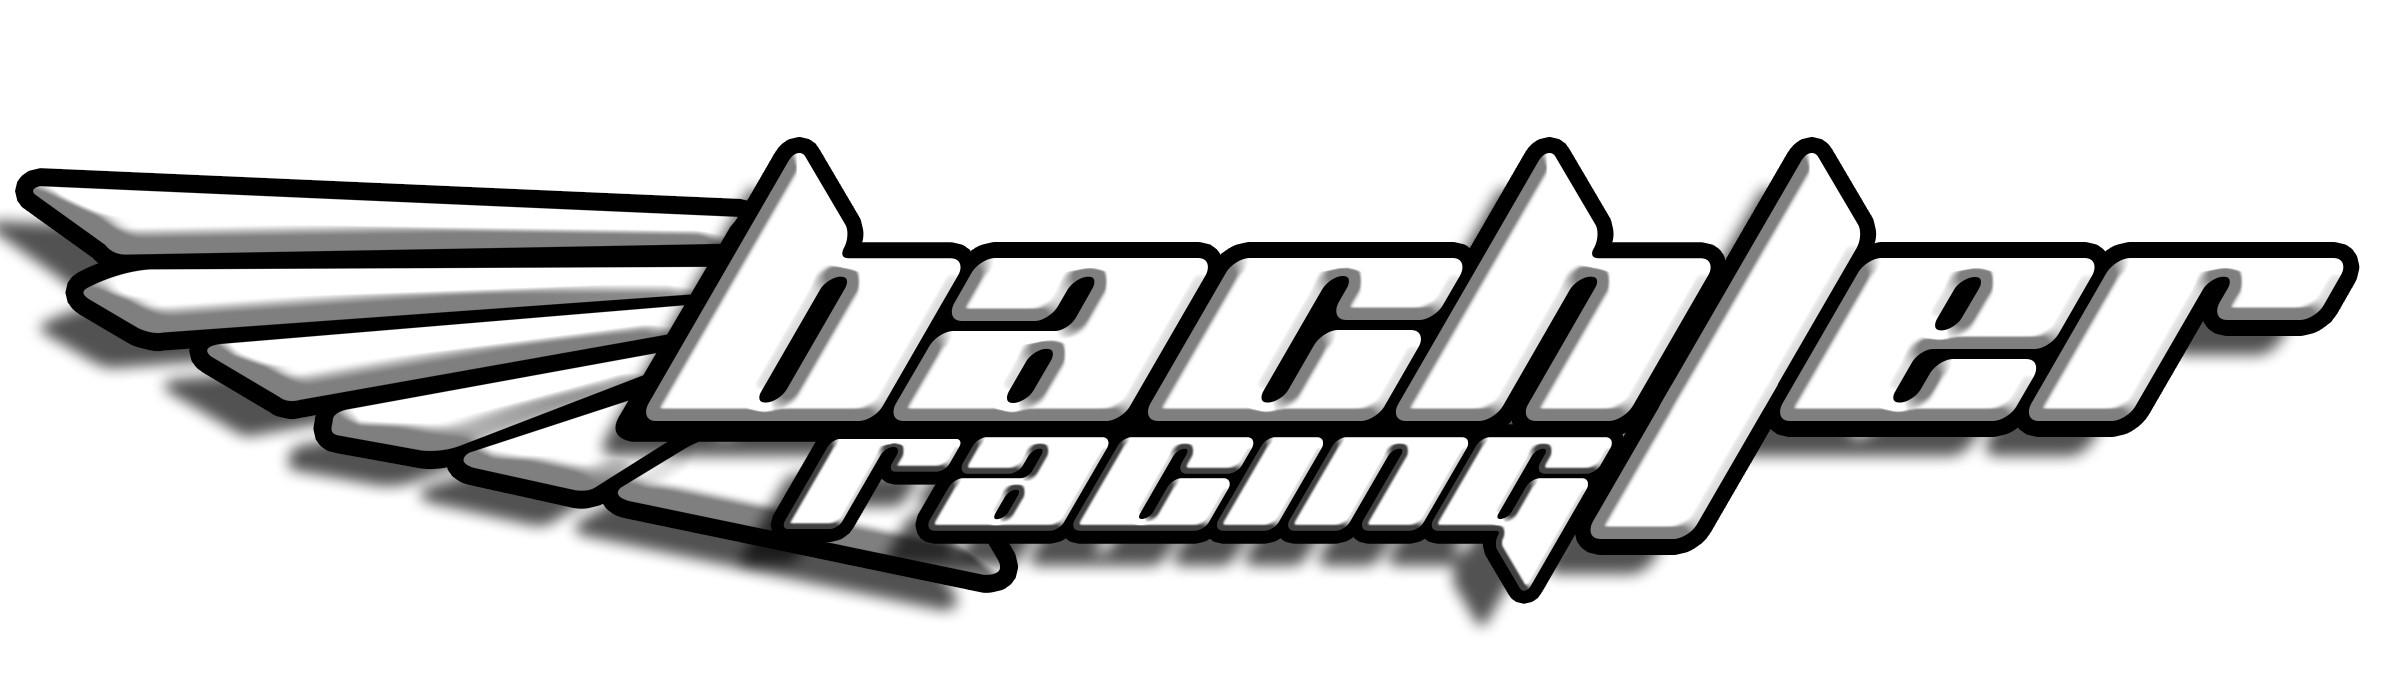 High Performance Parts >> Bachler Racing High Performance Parts Subaru Rally Parts